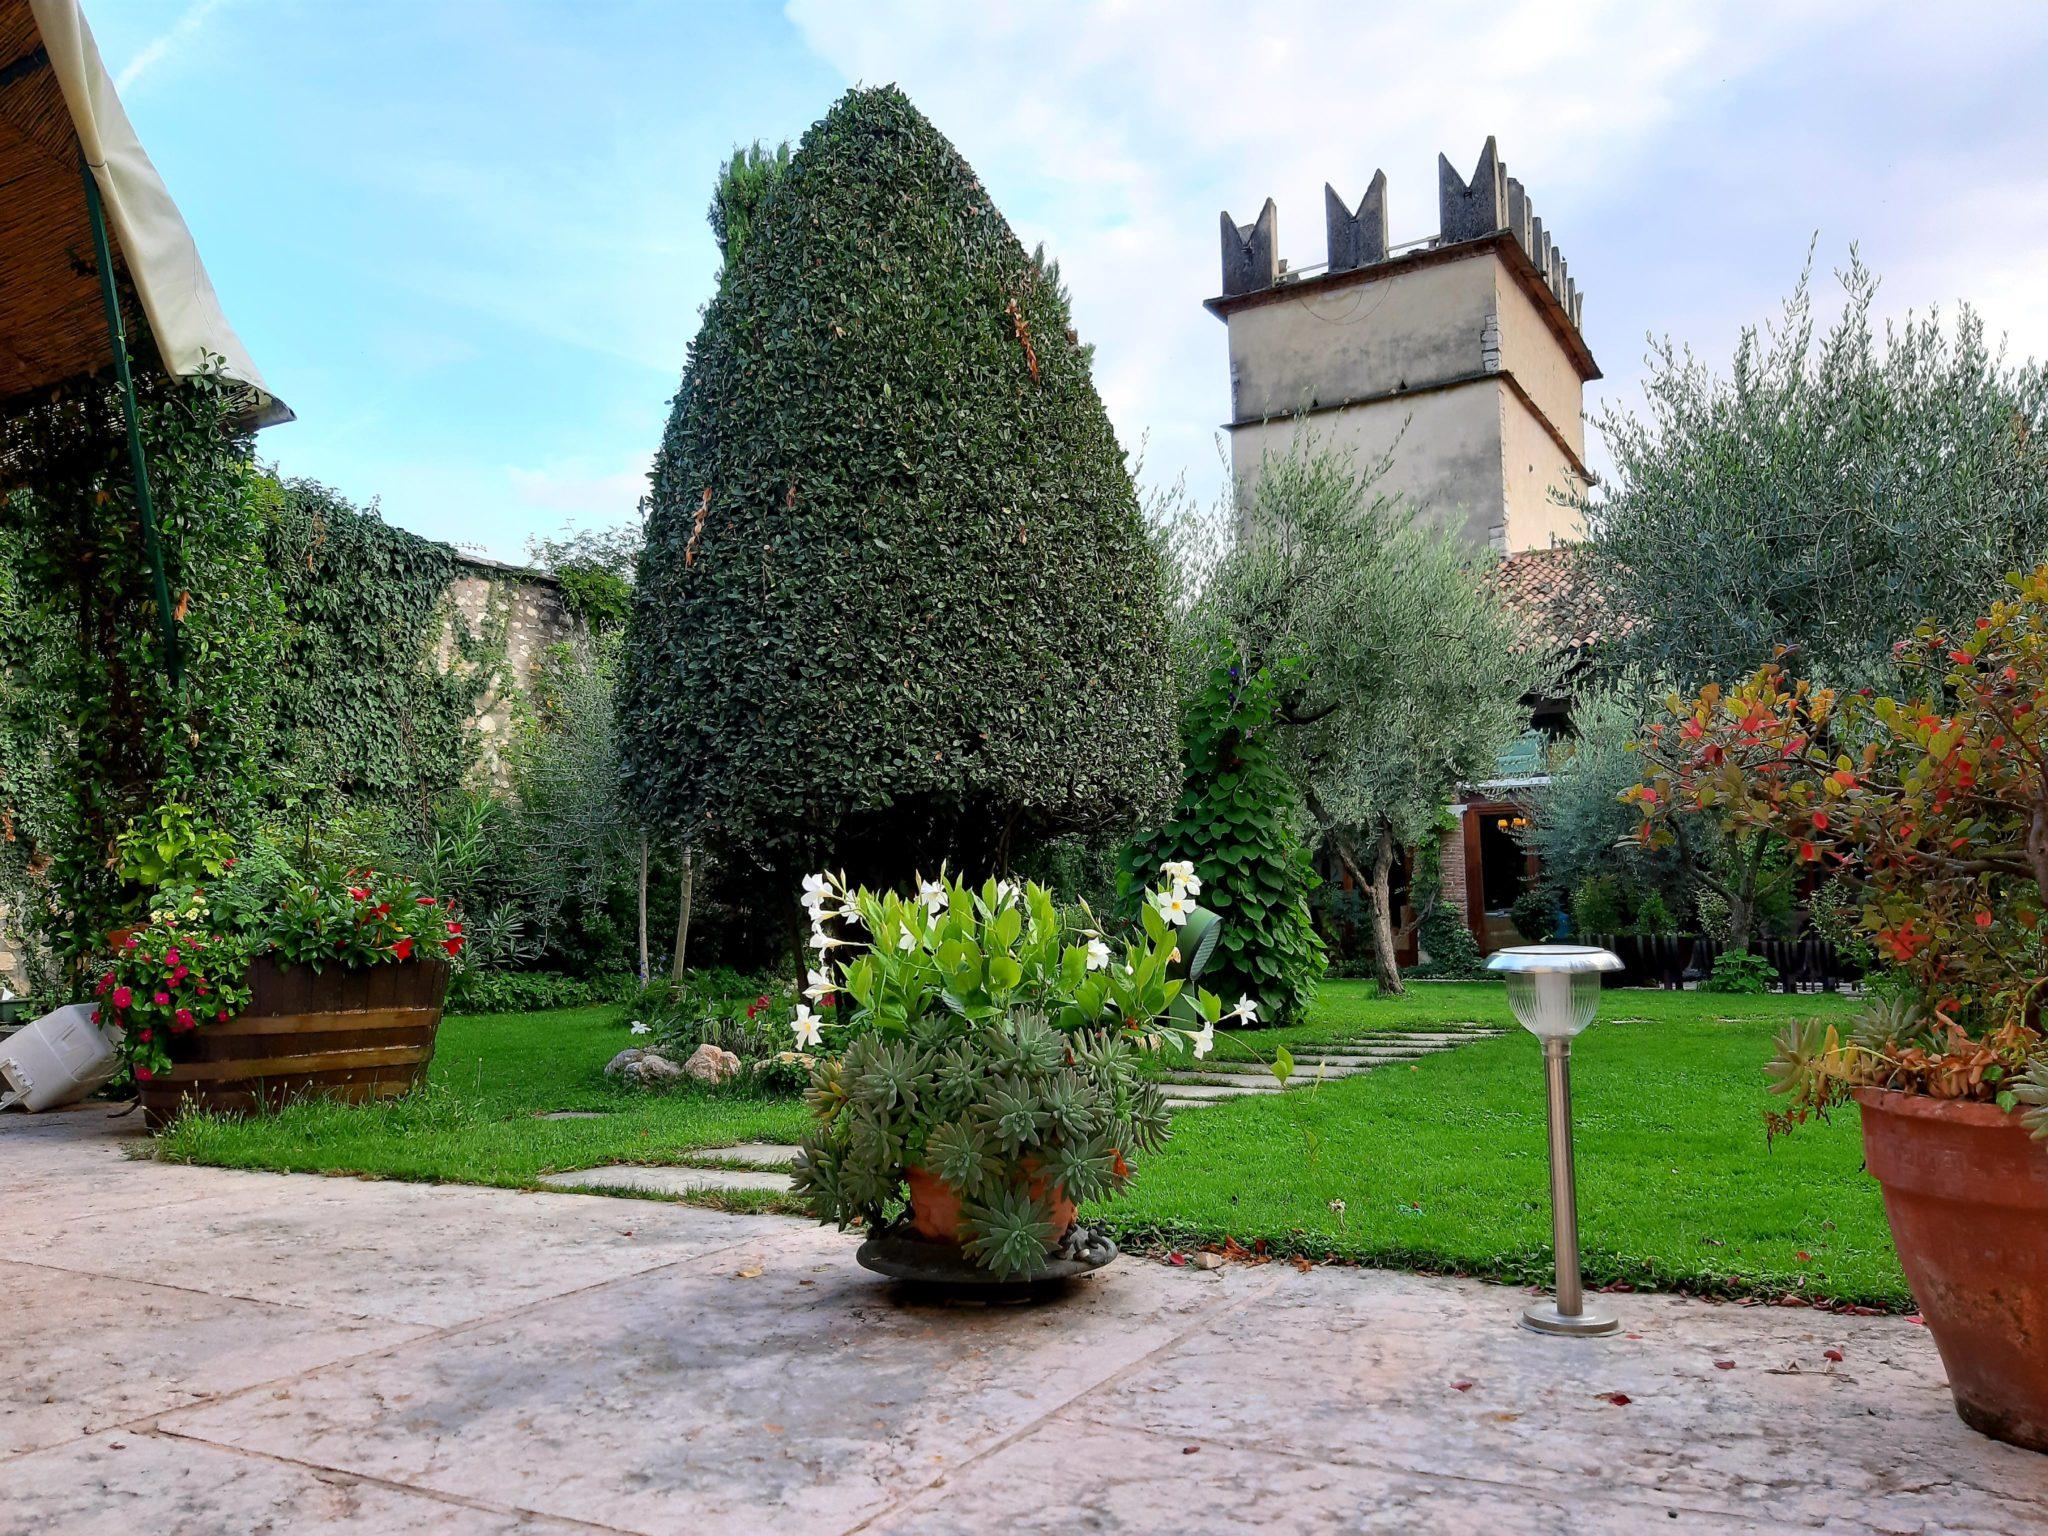 Corteforte giardino